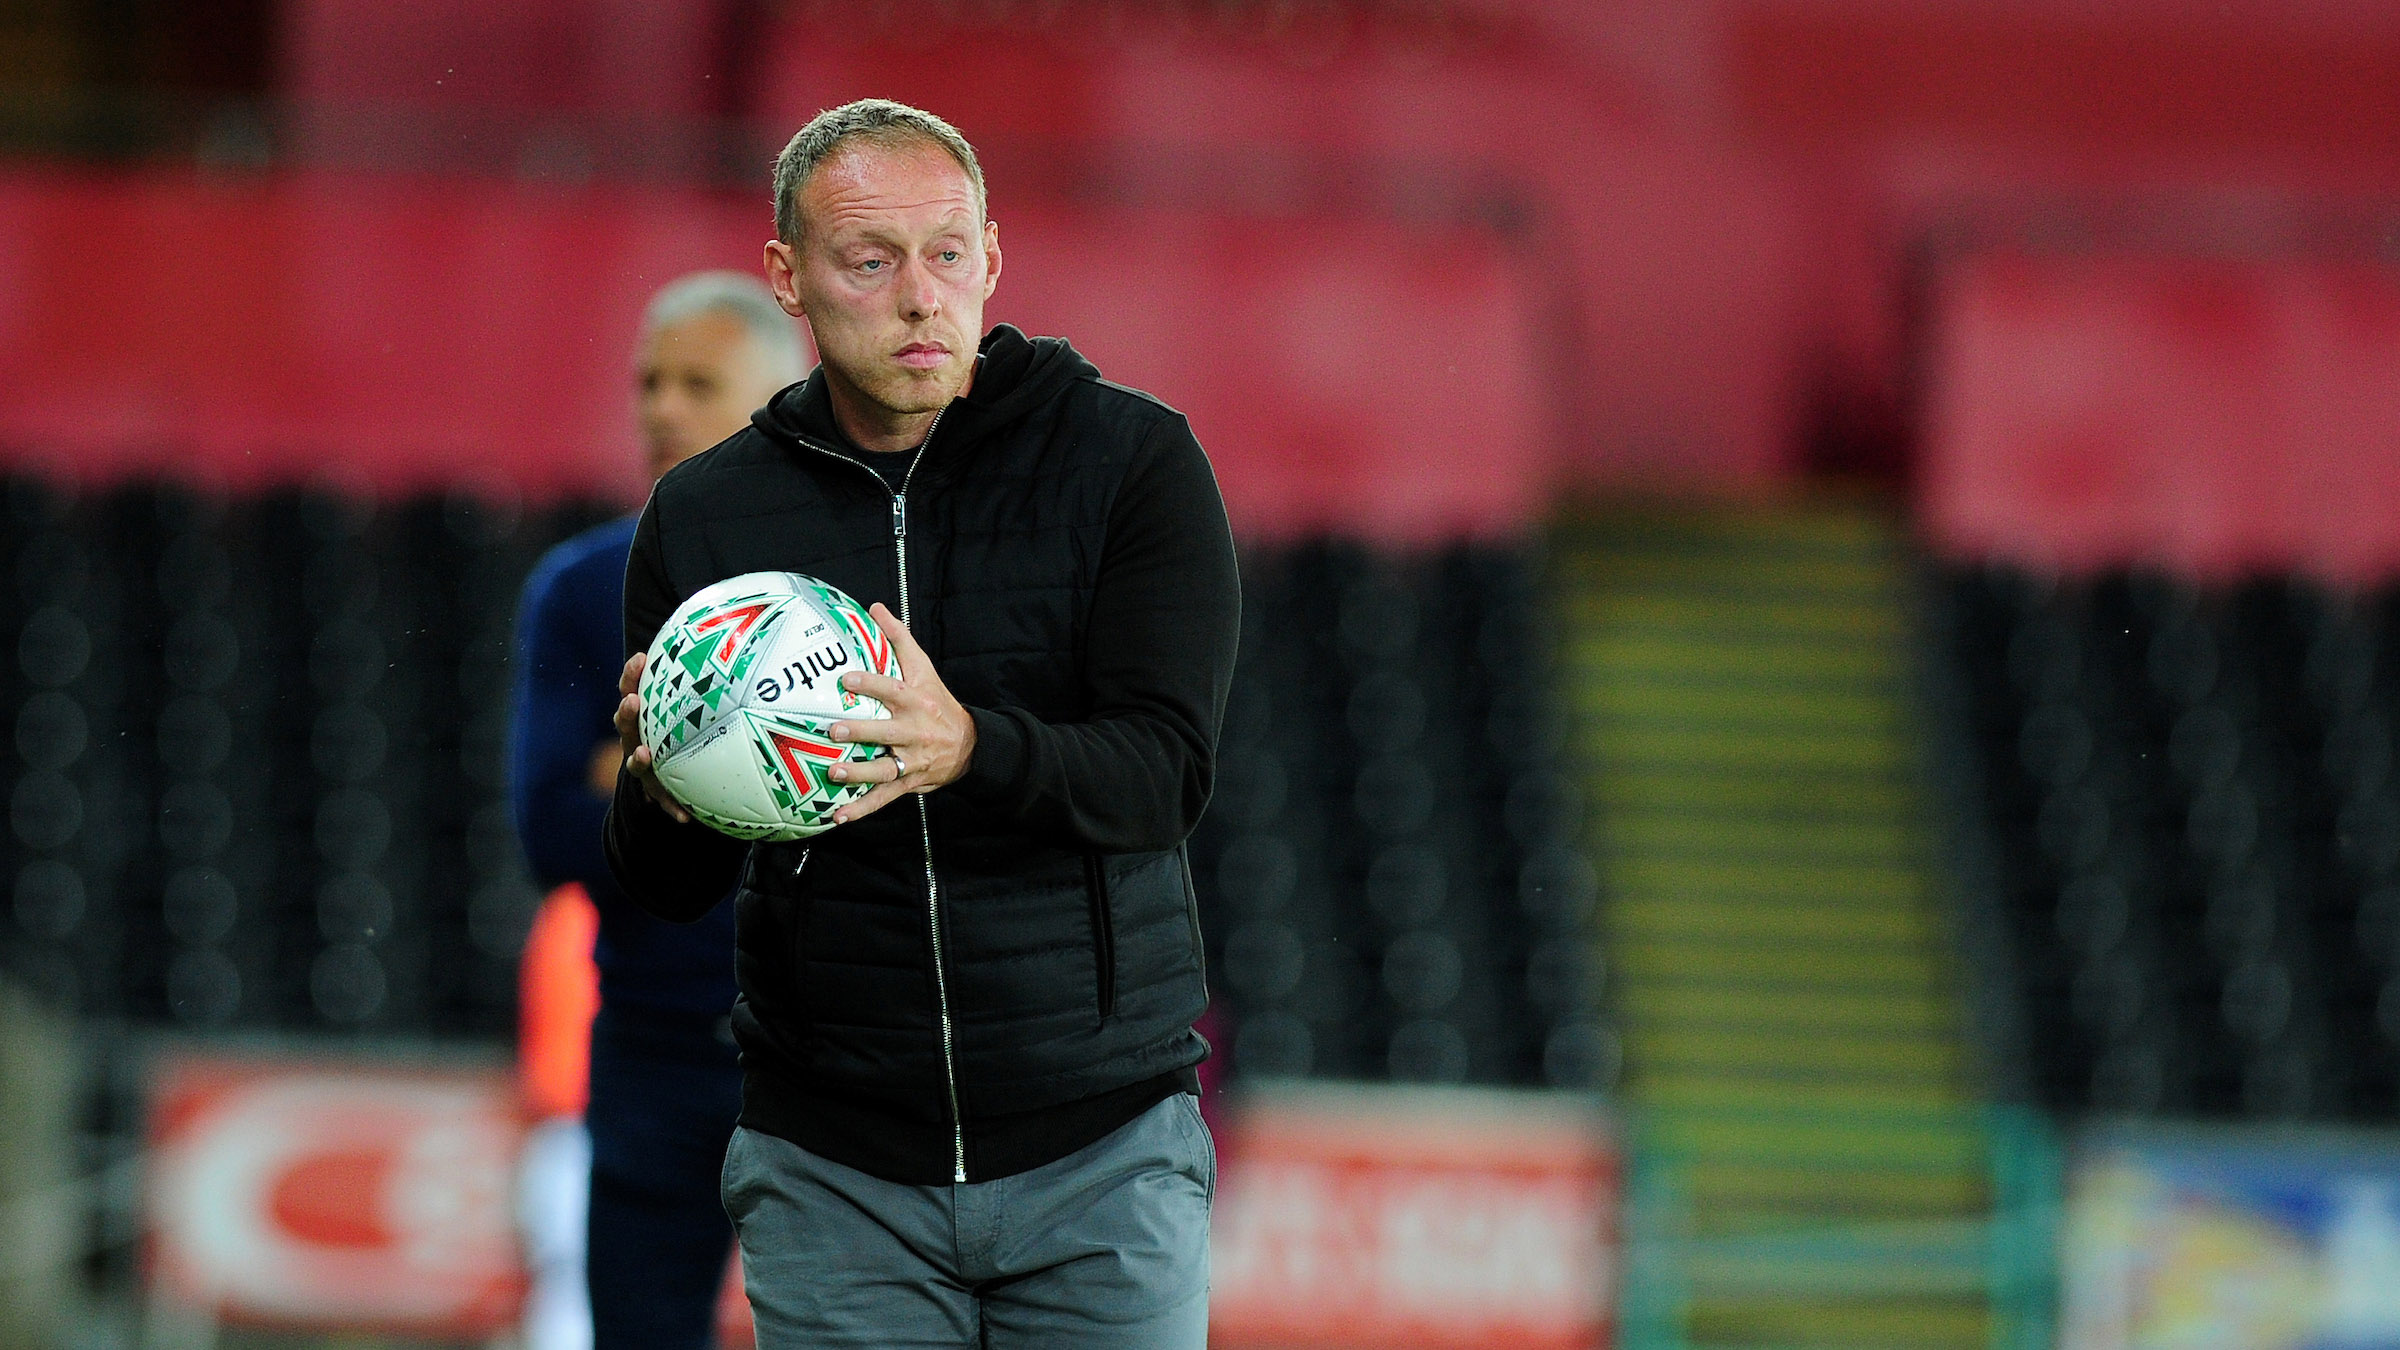 Swansea City head coach Steve Cooper